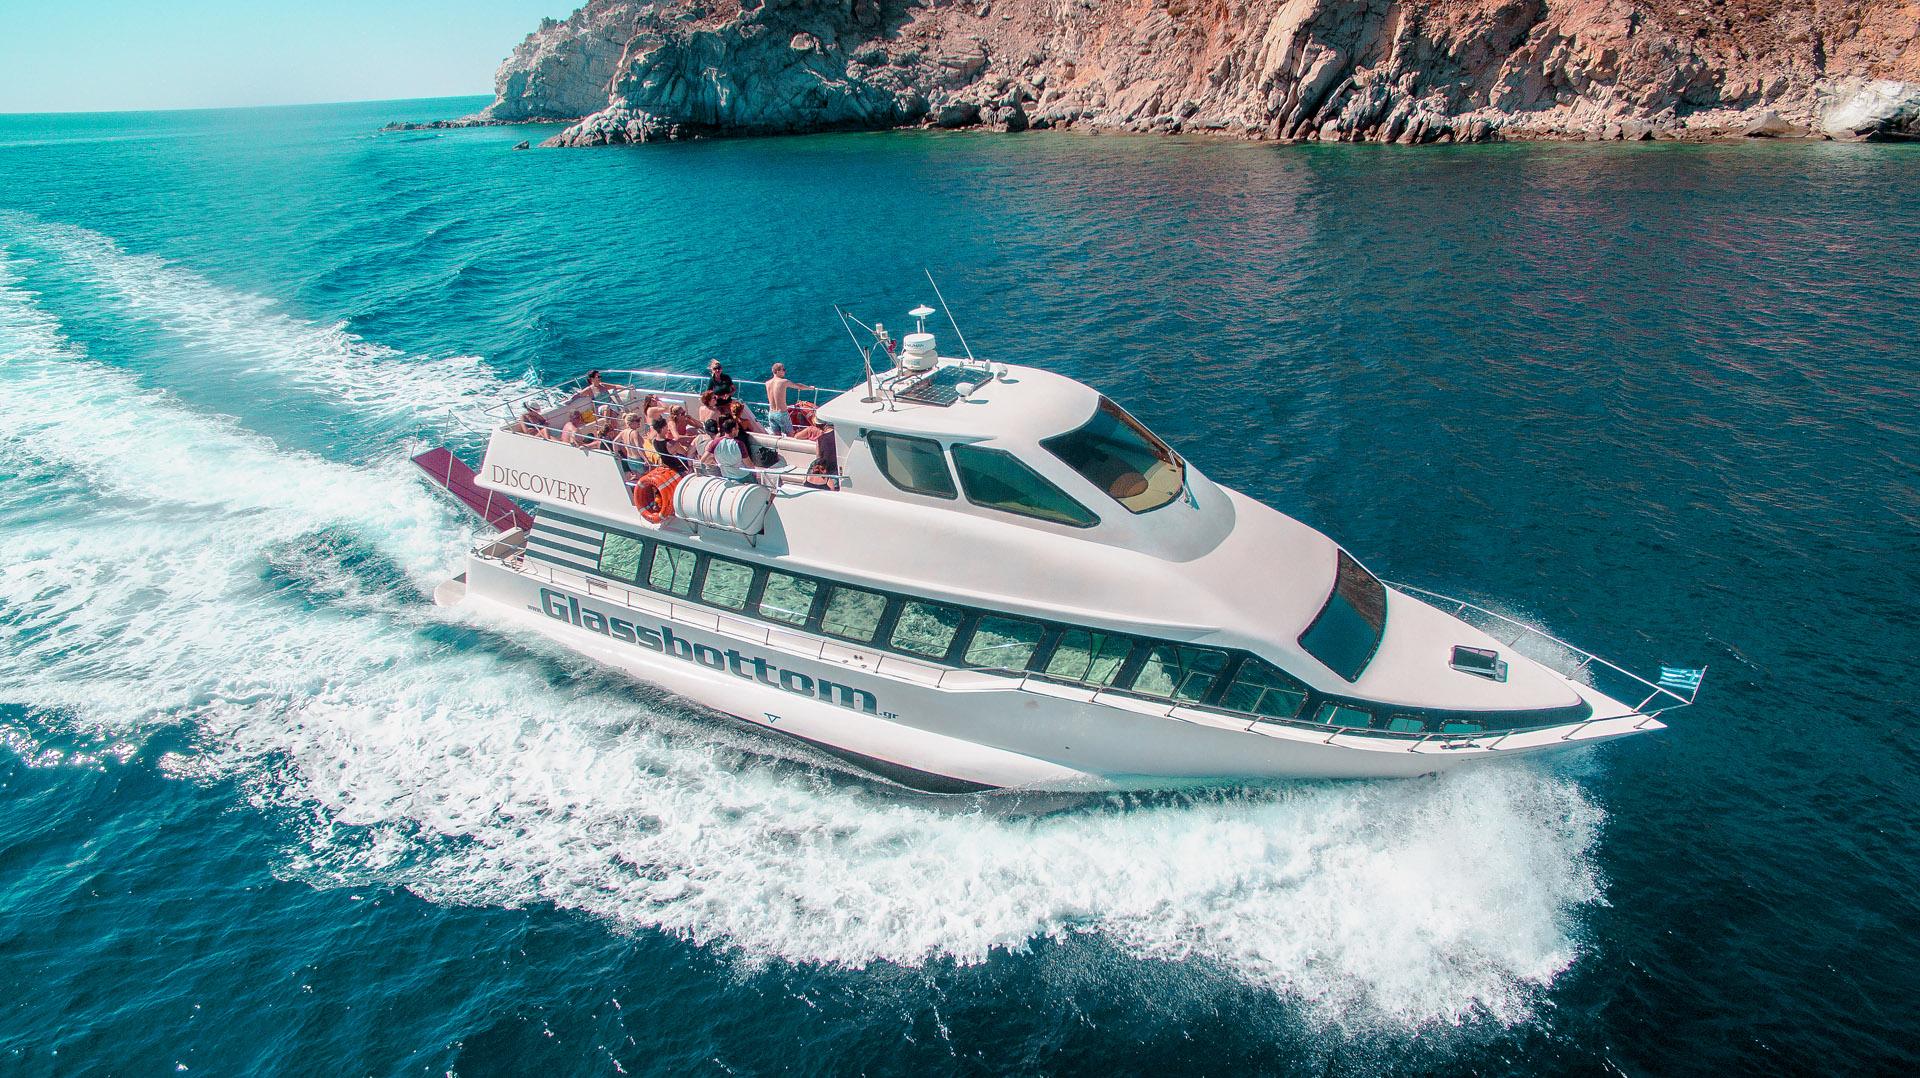 Mykonos Beach to Beach Cruise - Discovery Glassbottom Yacht